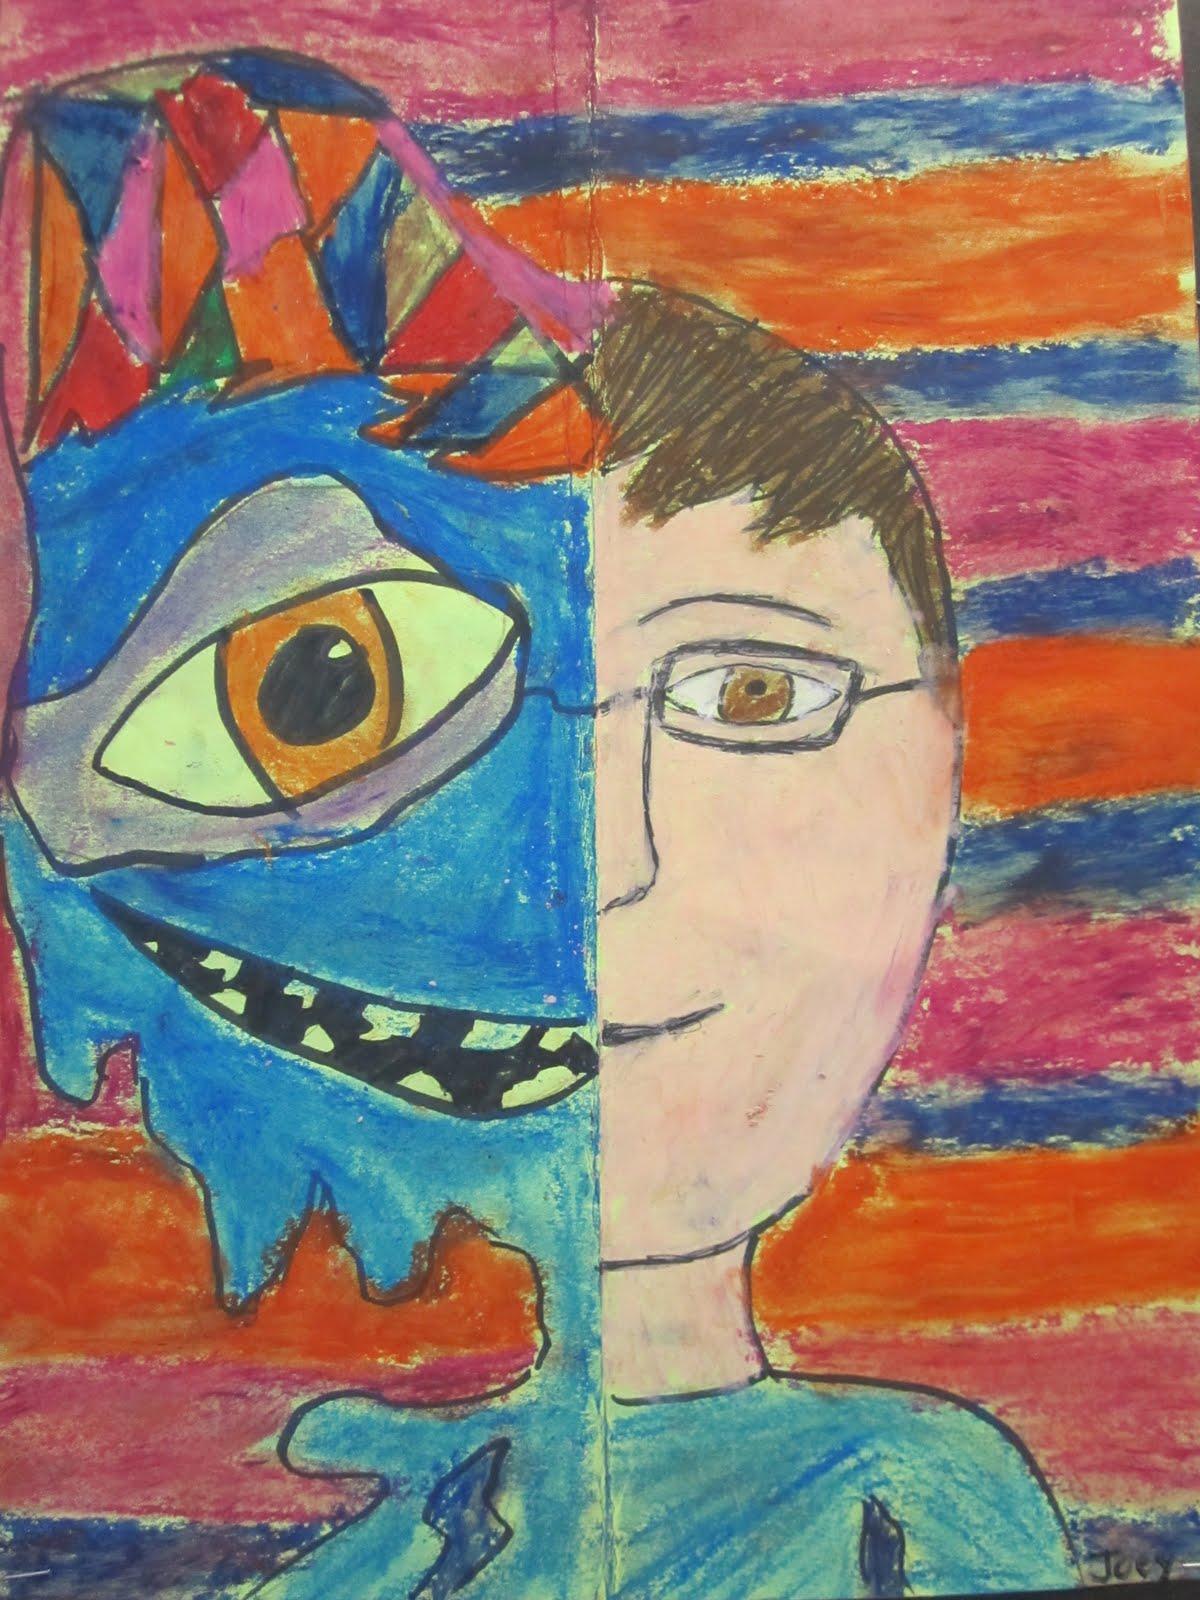 Think Create Art Picasso Faces Art Smart Beck Center Camp